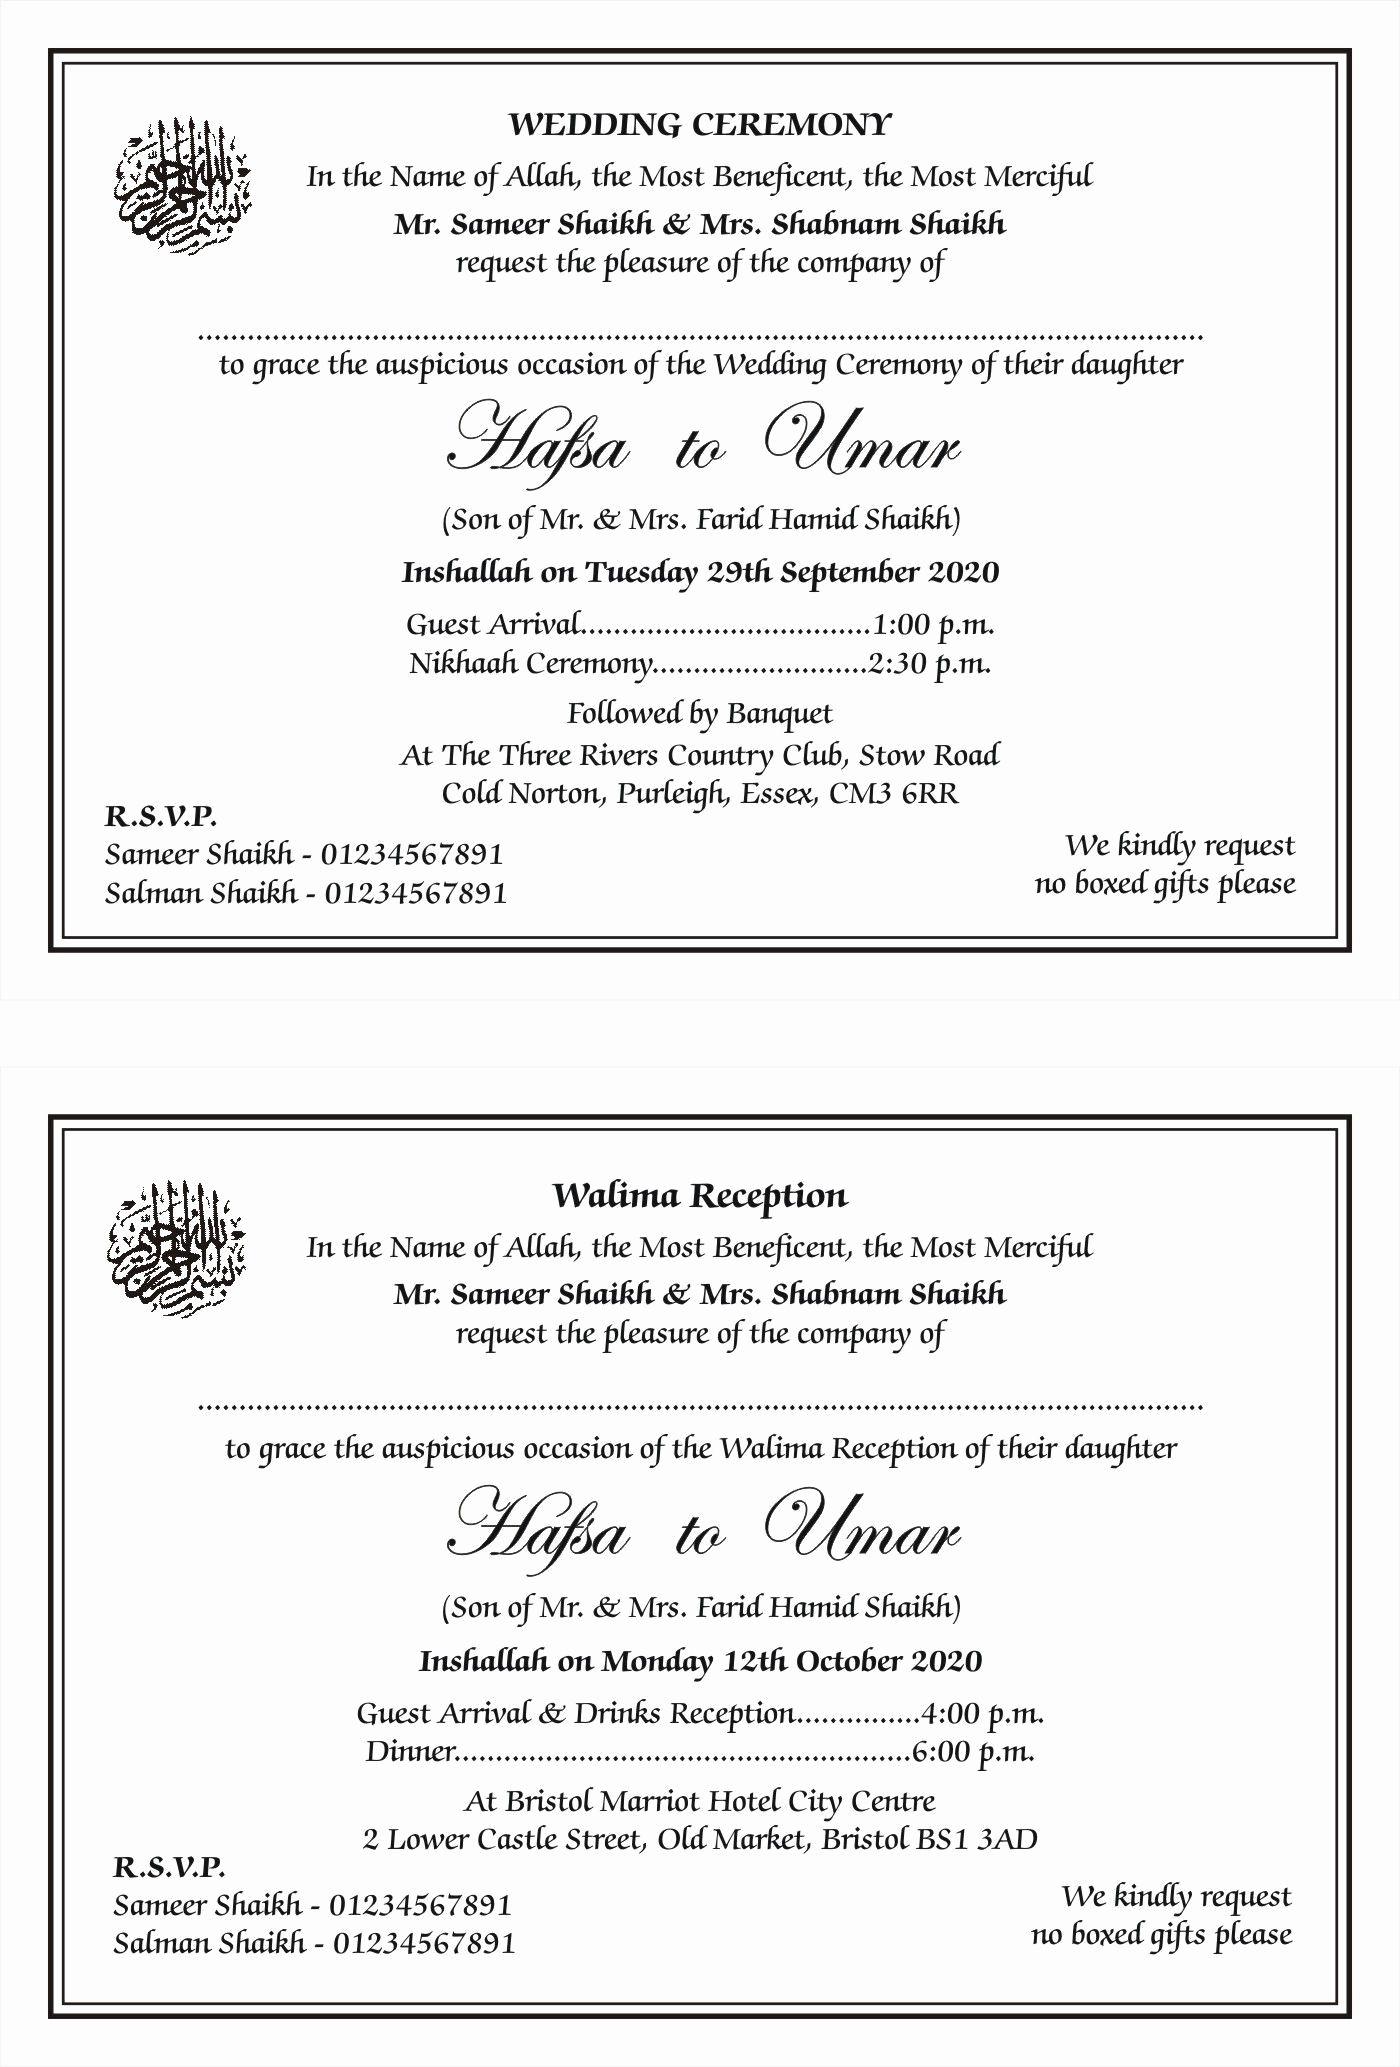 Walima Invitation Cards Wordings Fresh Shaadi Cards Wordings Muslim Wedding Invitations Modern Wedding Invitation Wording Marriage Cards